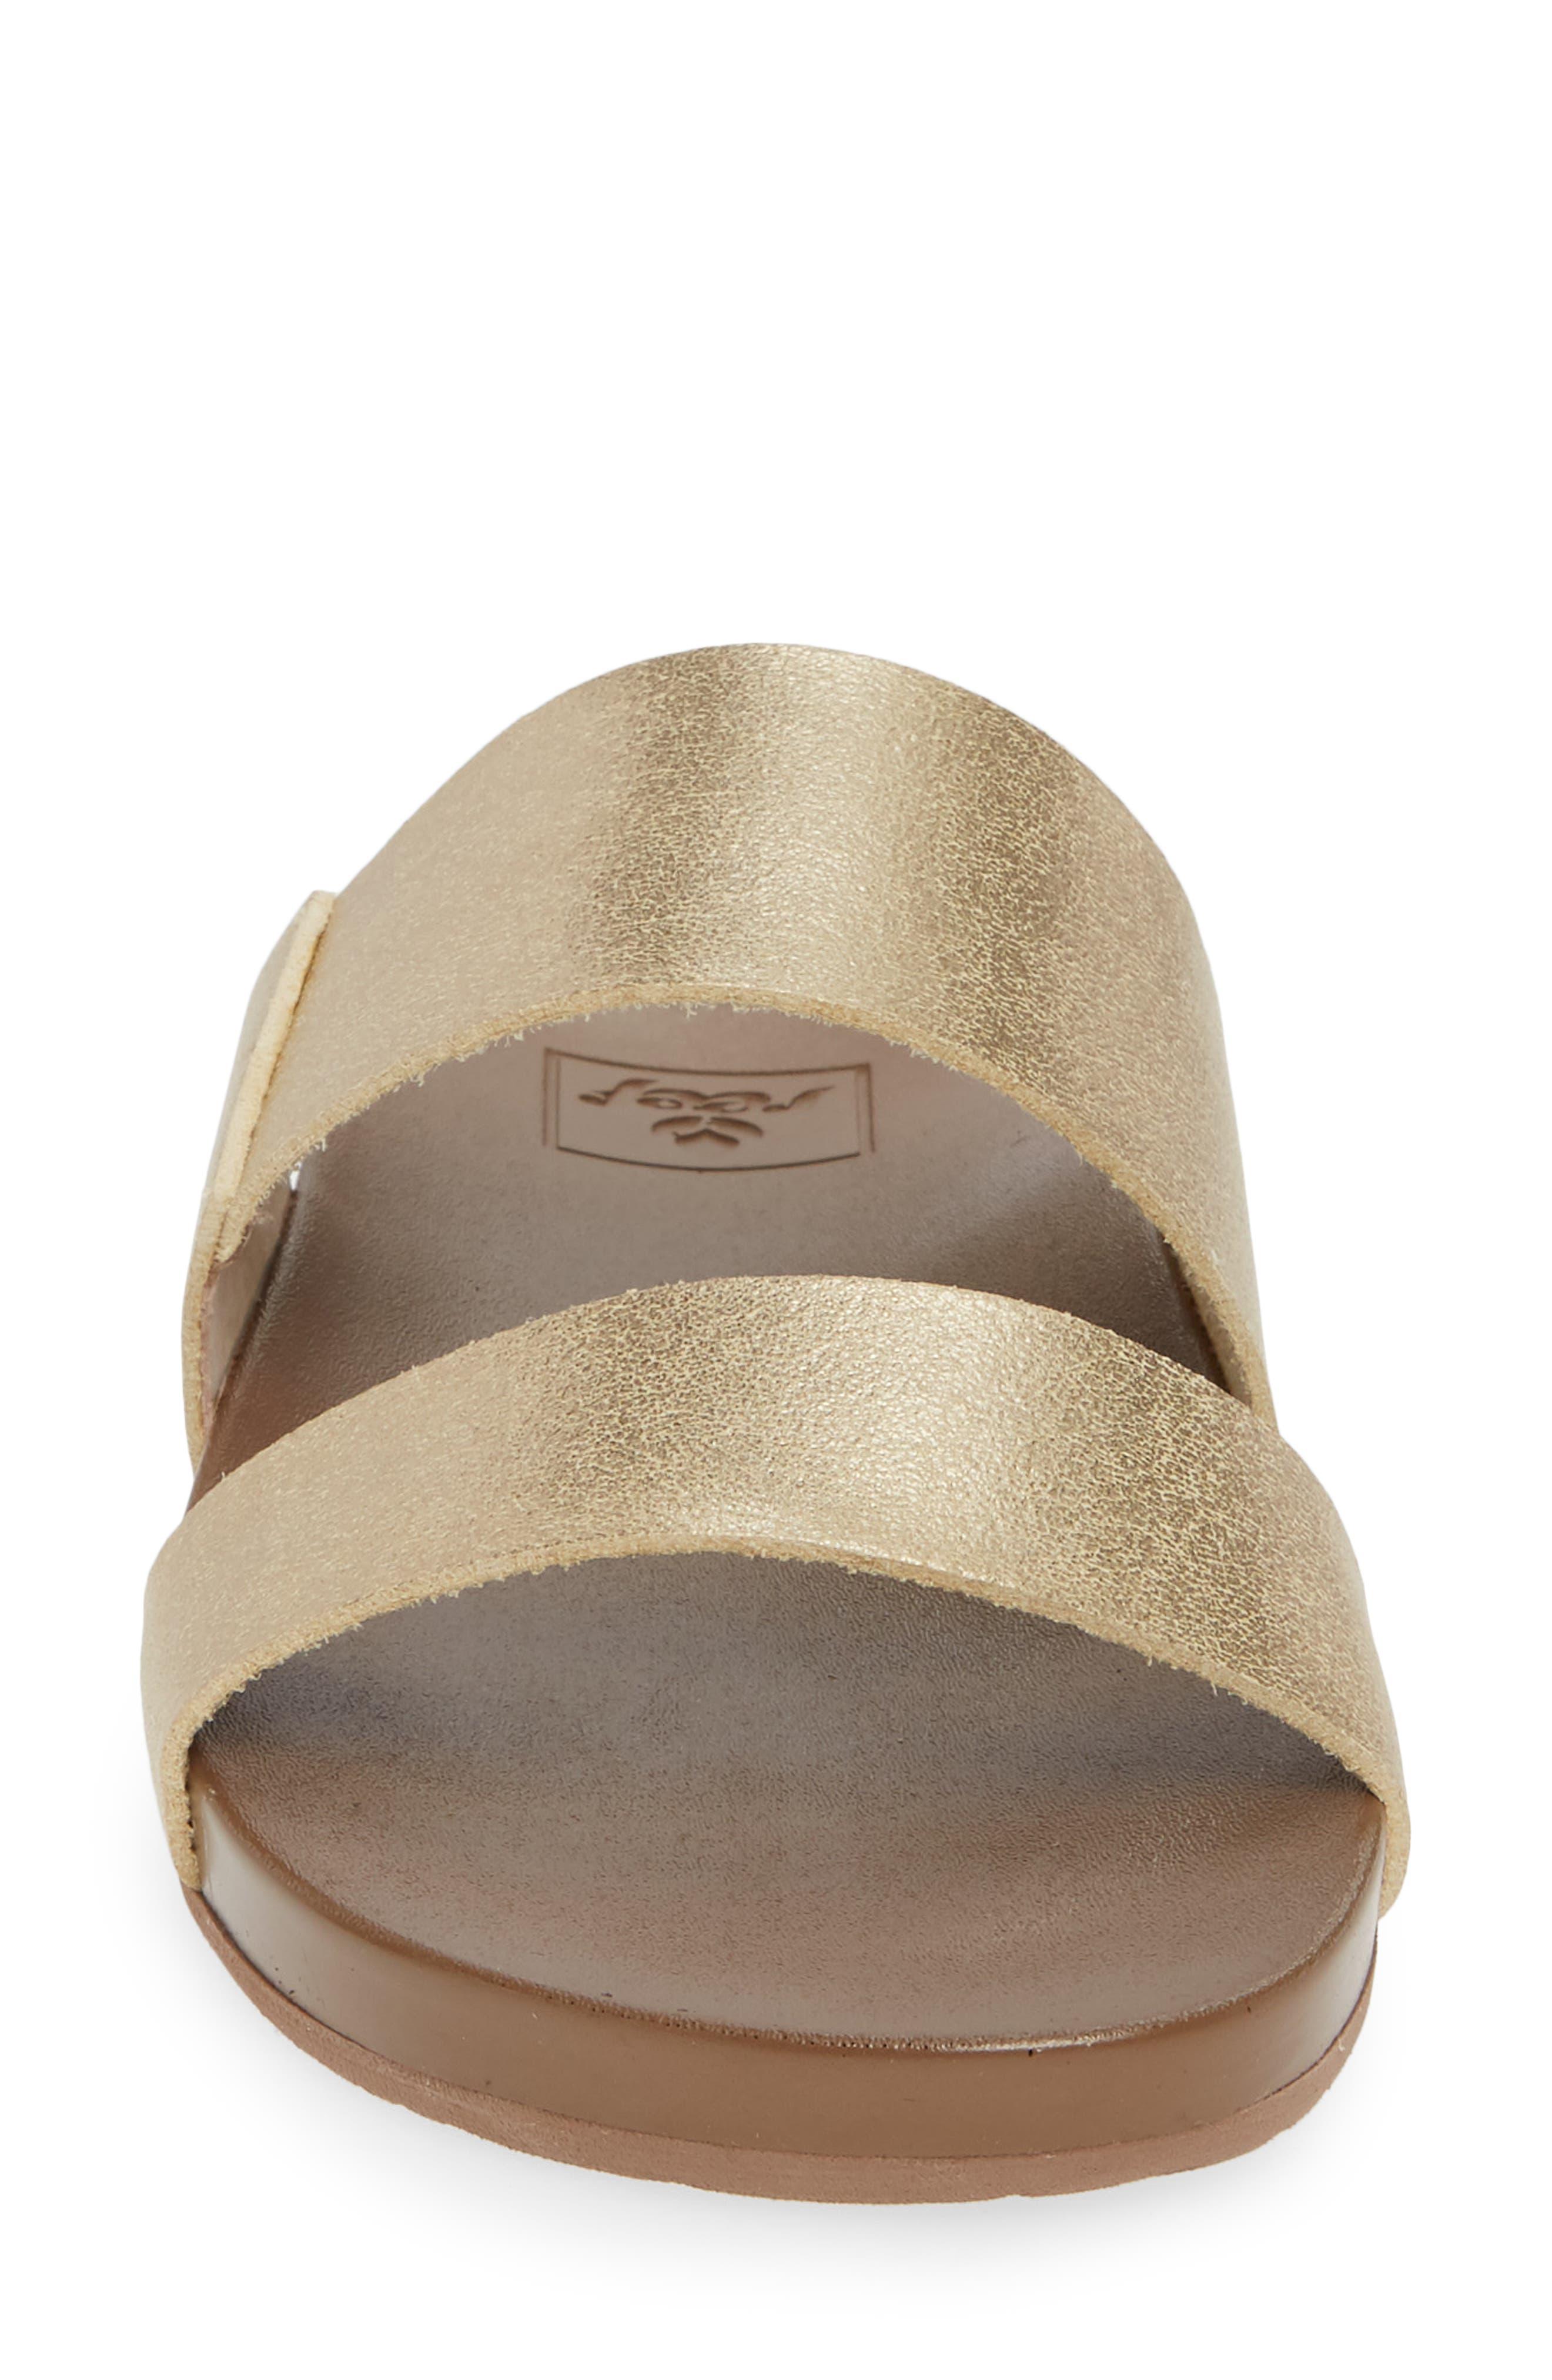 REEF,                             Cushion Bounce Vista Slide Sandal,                             Alternate thumbnail 4, color,                             710